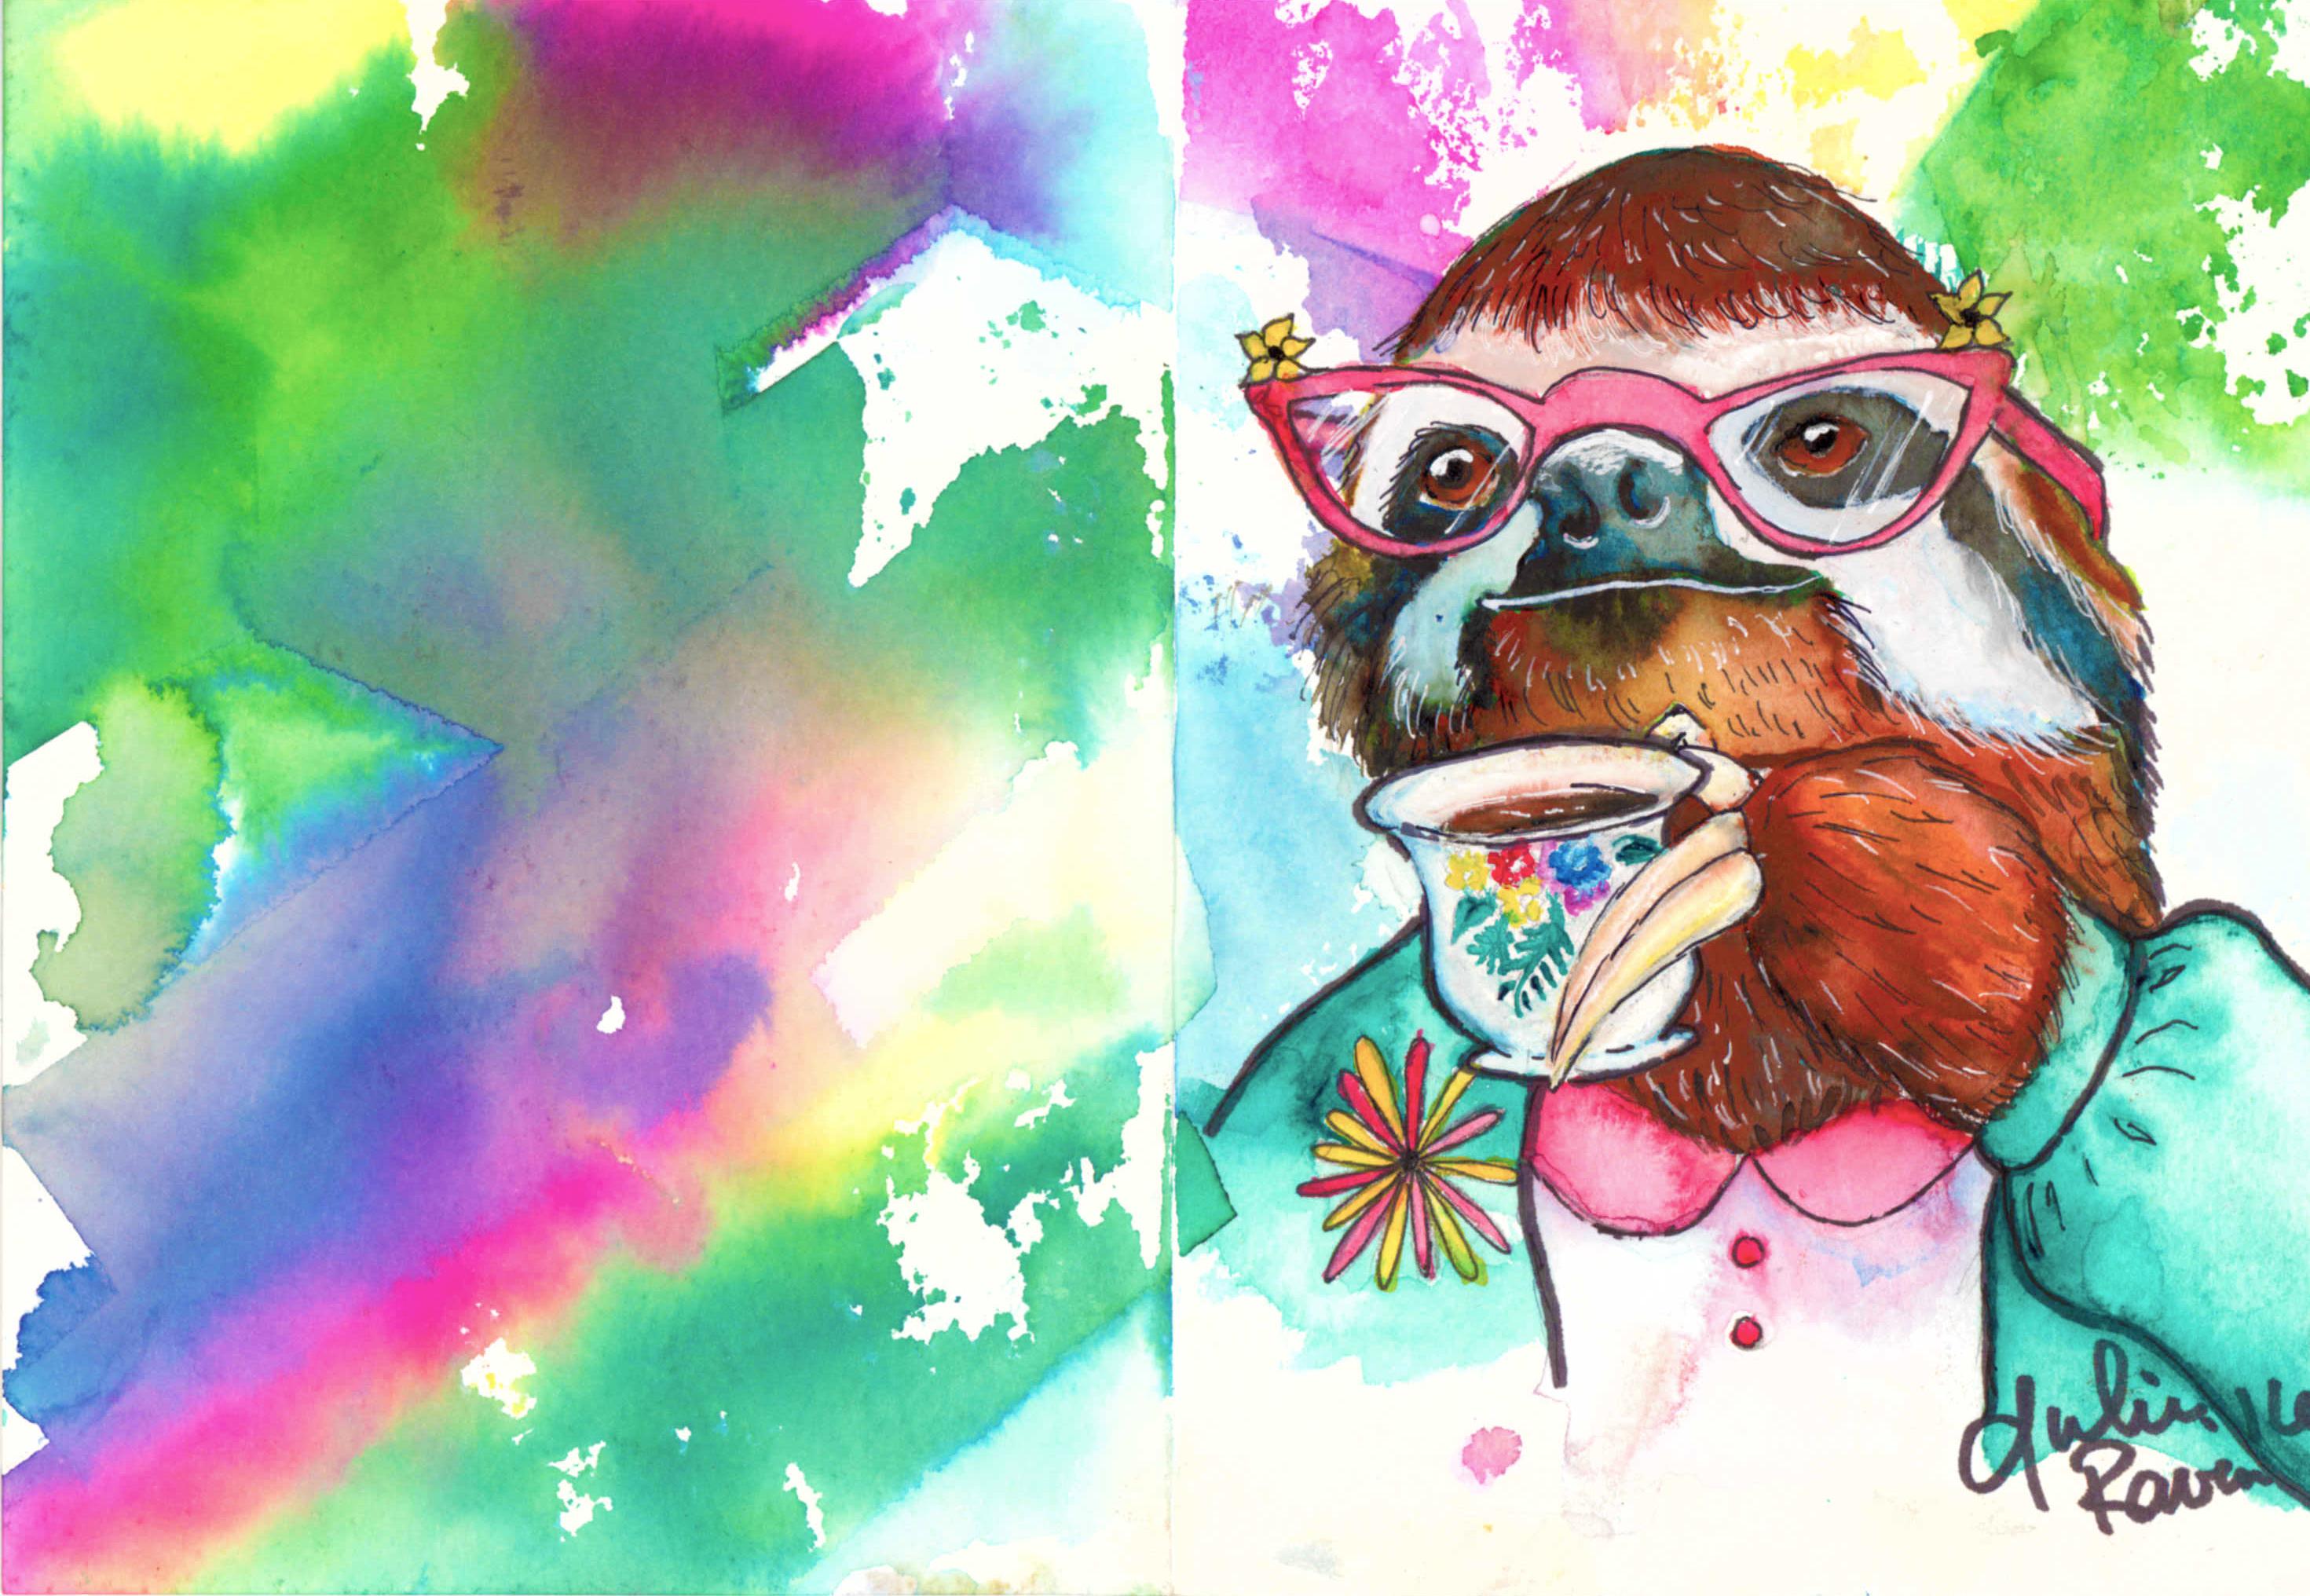 Ms. Sloth